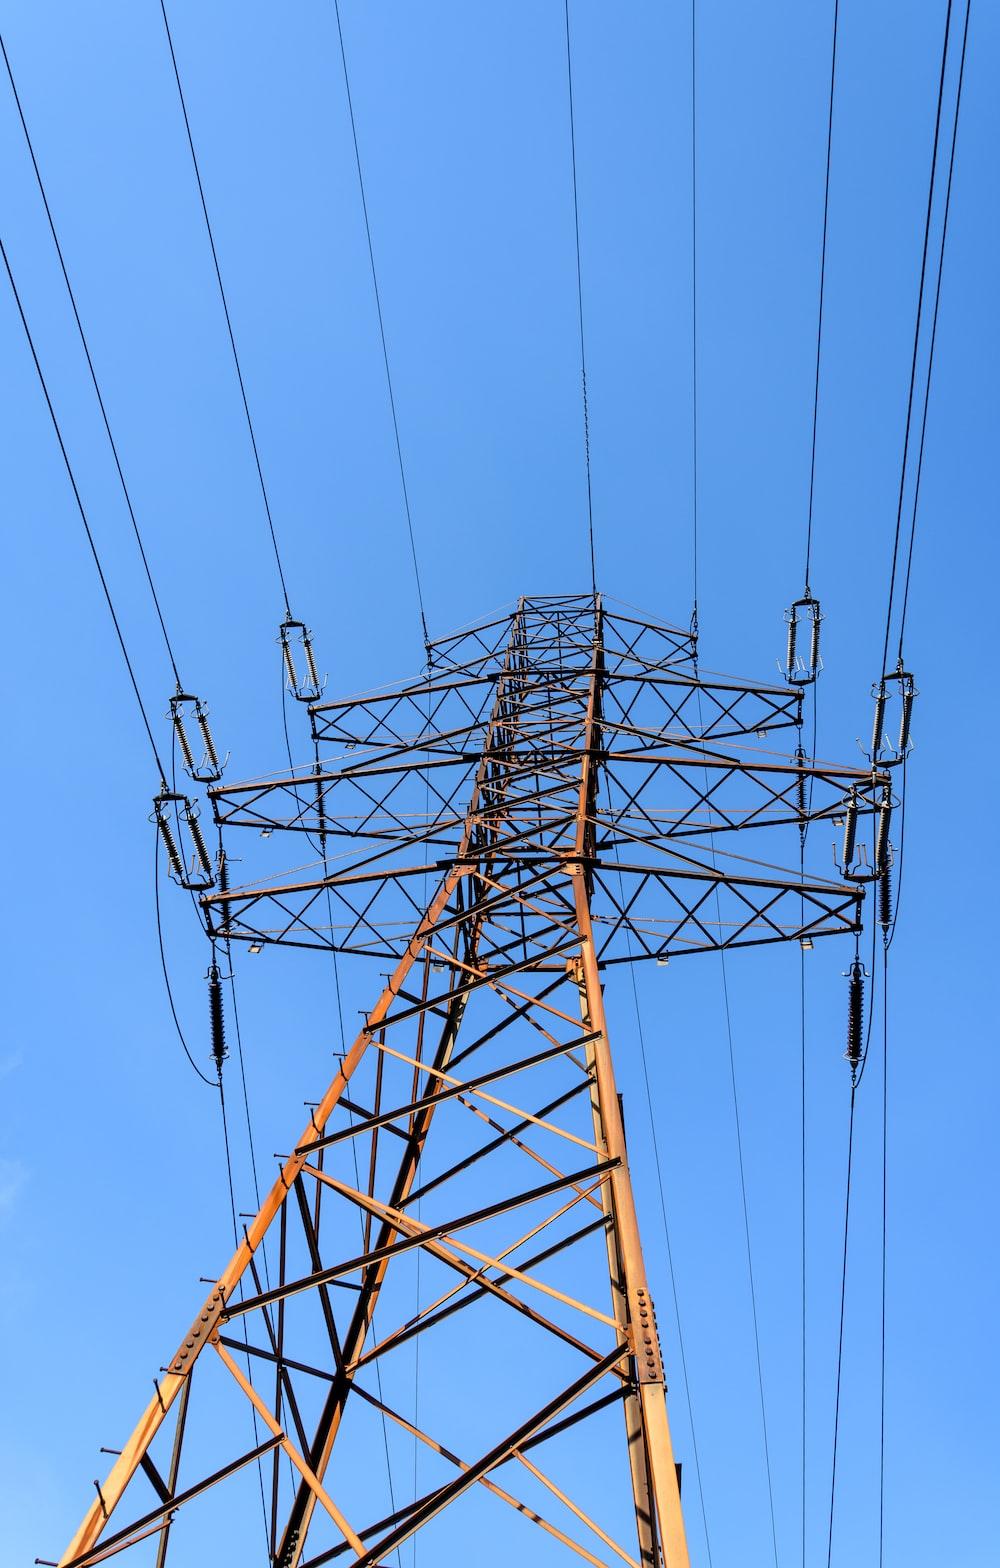 brown metal tower under blue sky during daytime